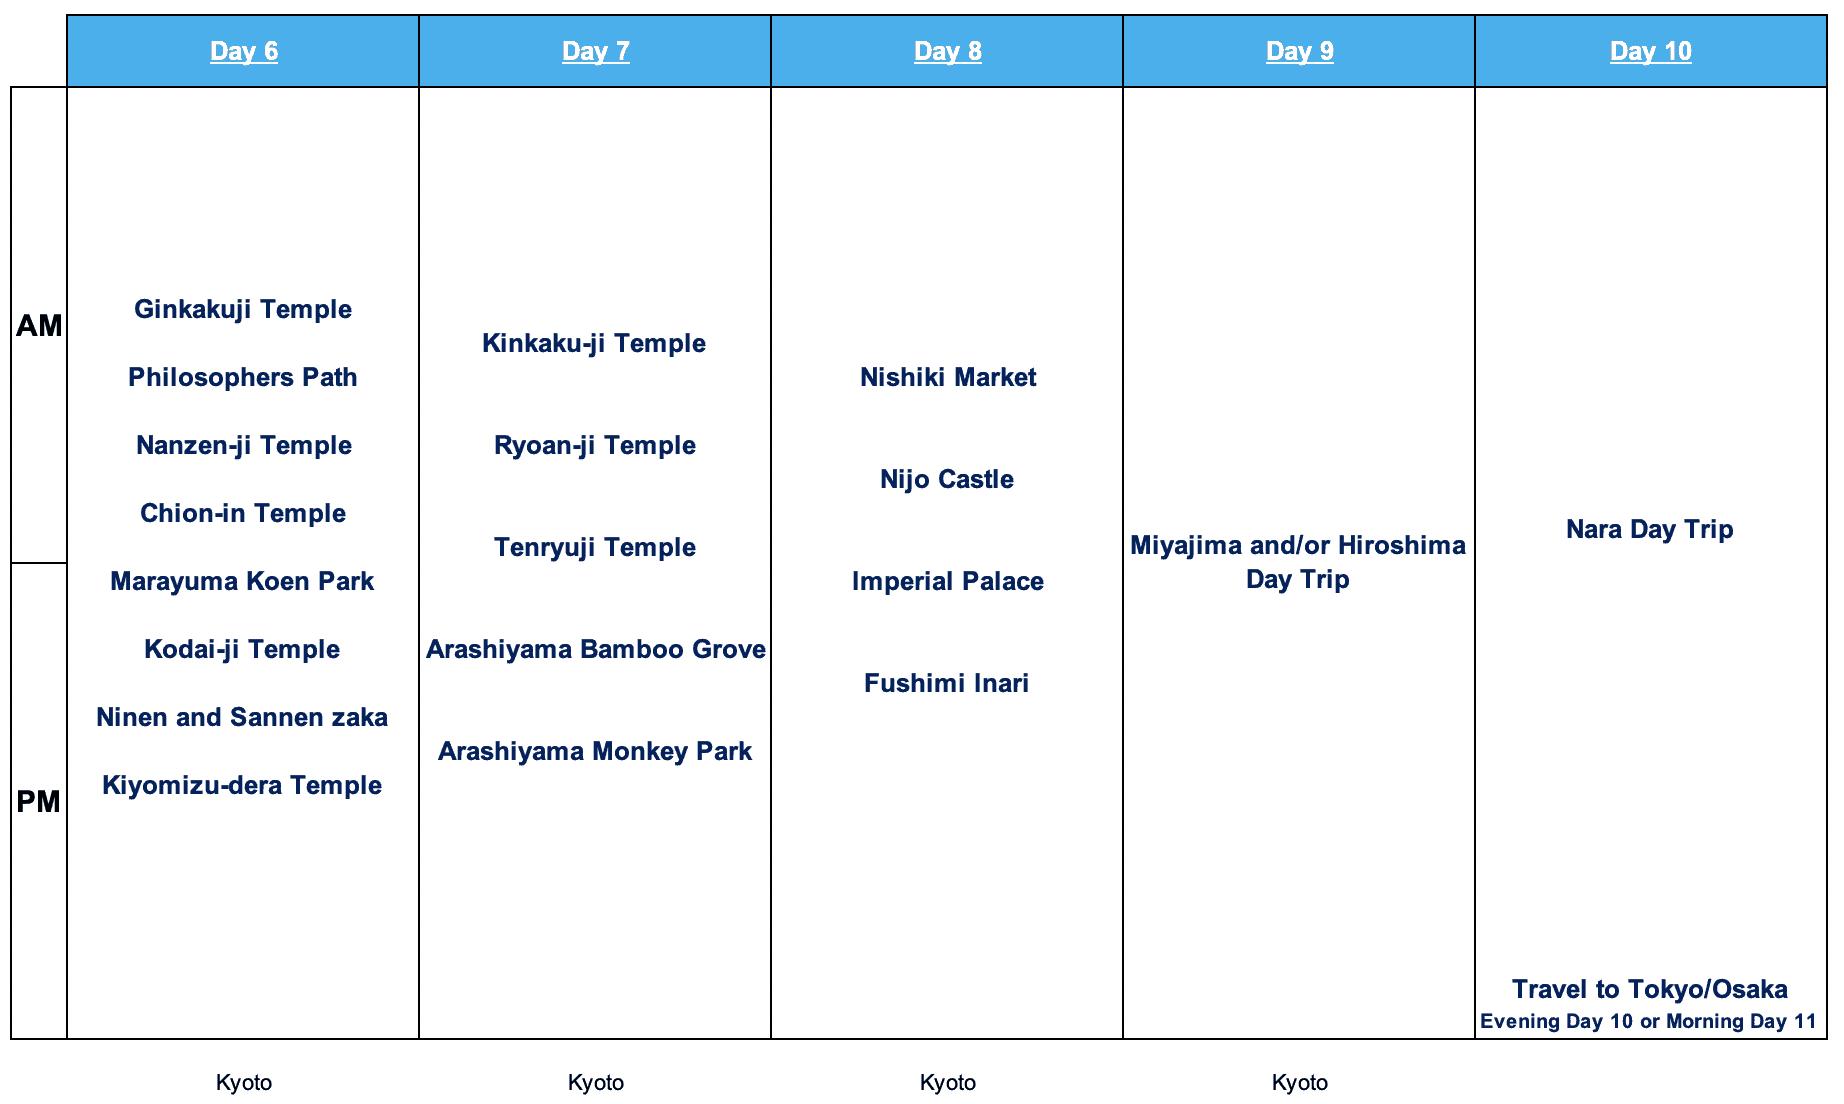 Japan 10 Day Itinerary #2